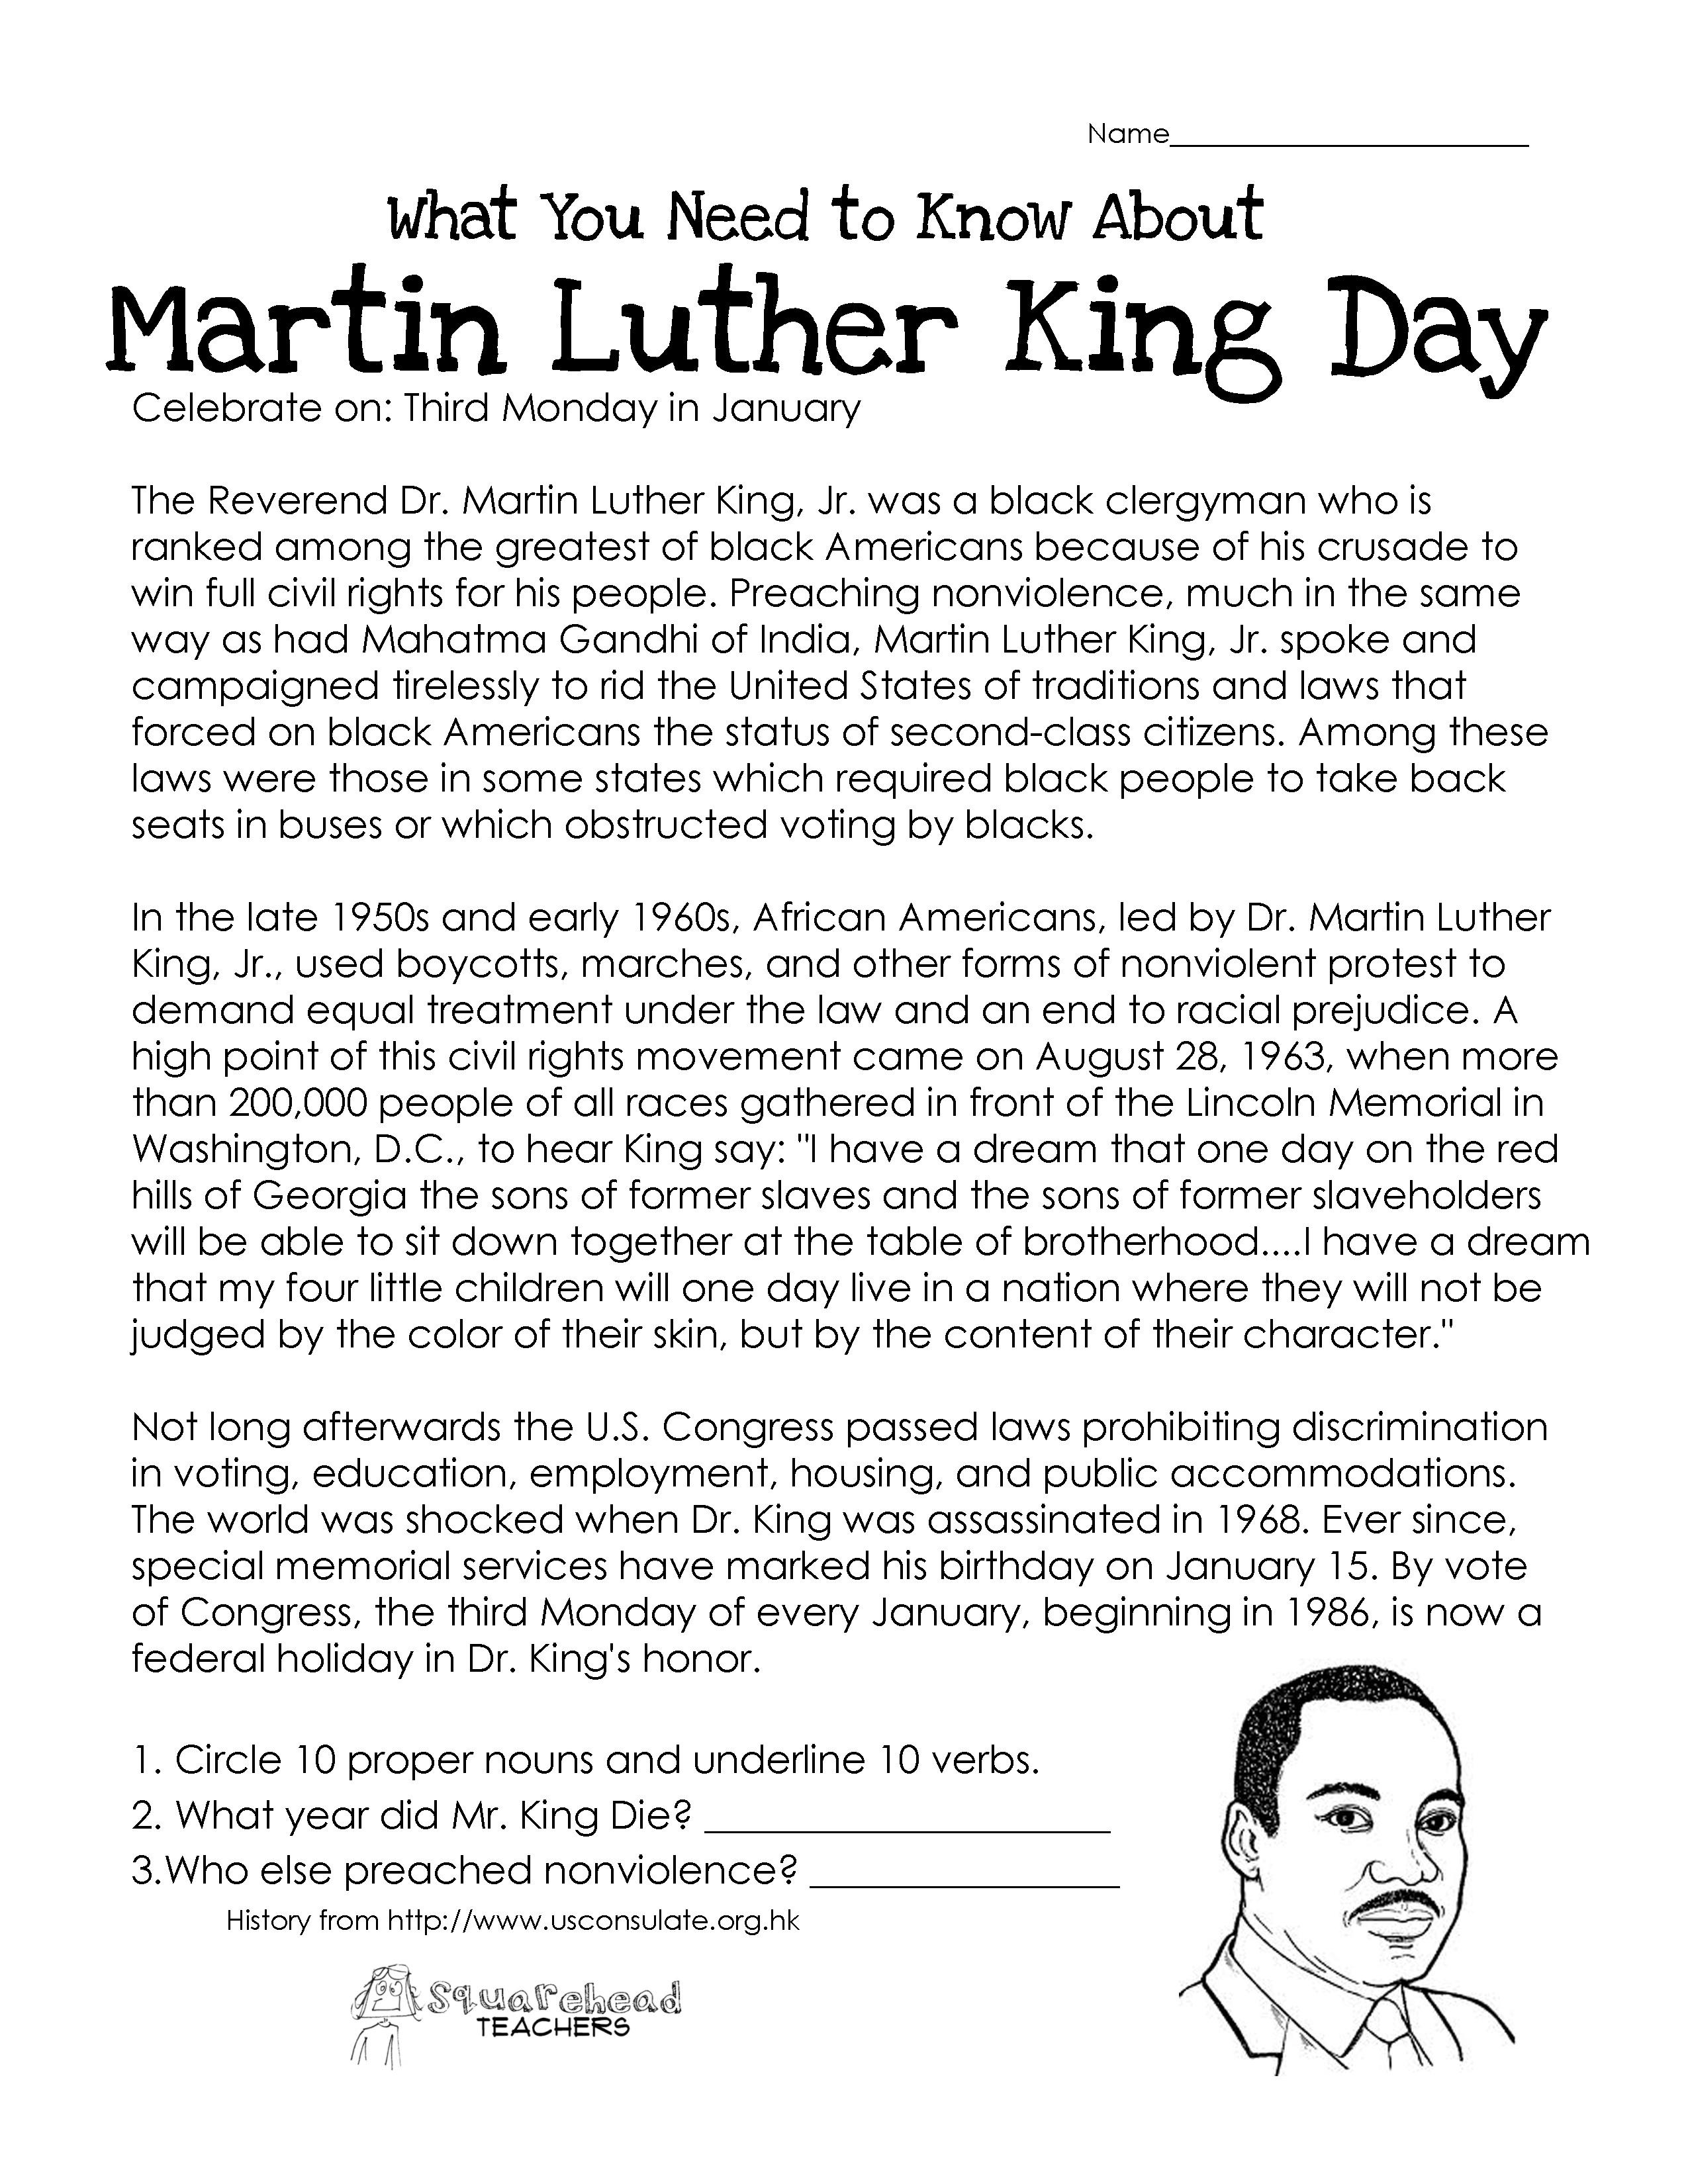 Martin Luther King Day (Free Worksheet)   Squarehead Teachers - Free Printable Martin Luther King Jr Worksheets For Kindergarten